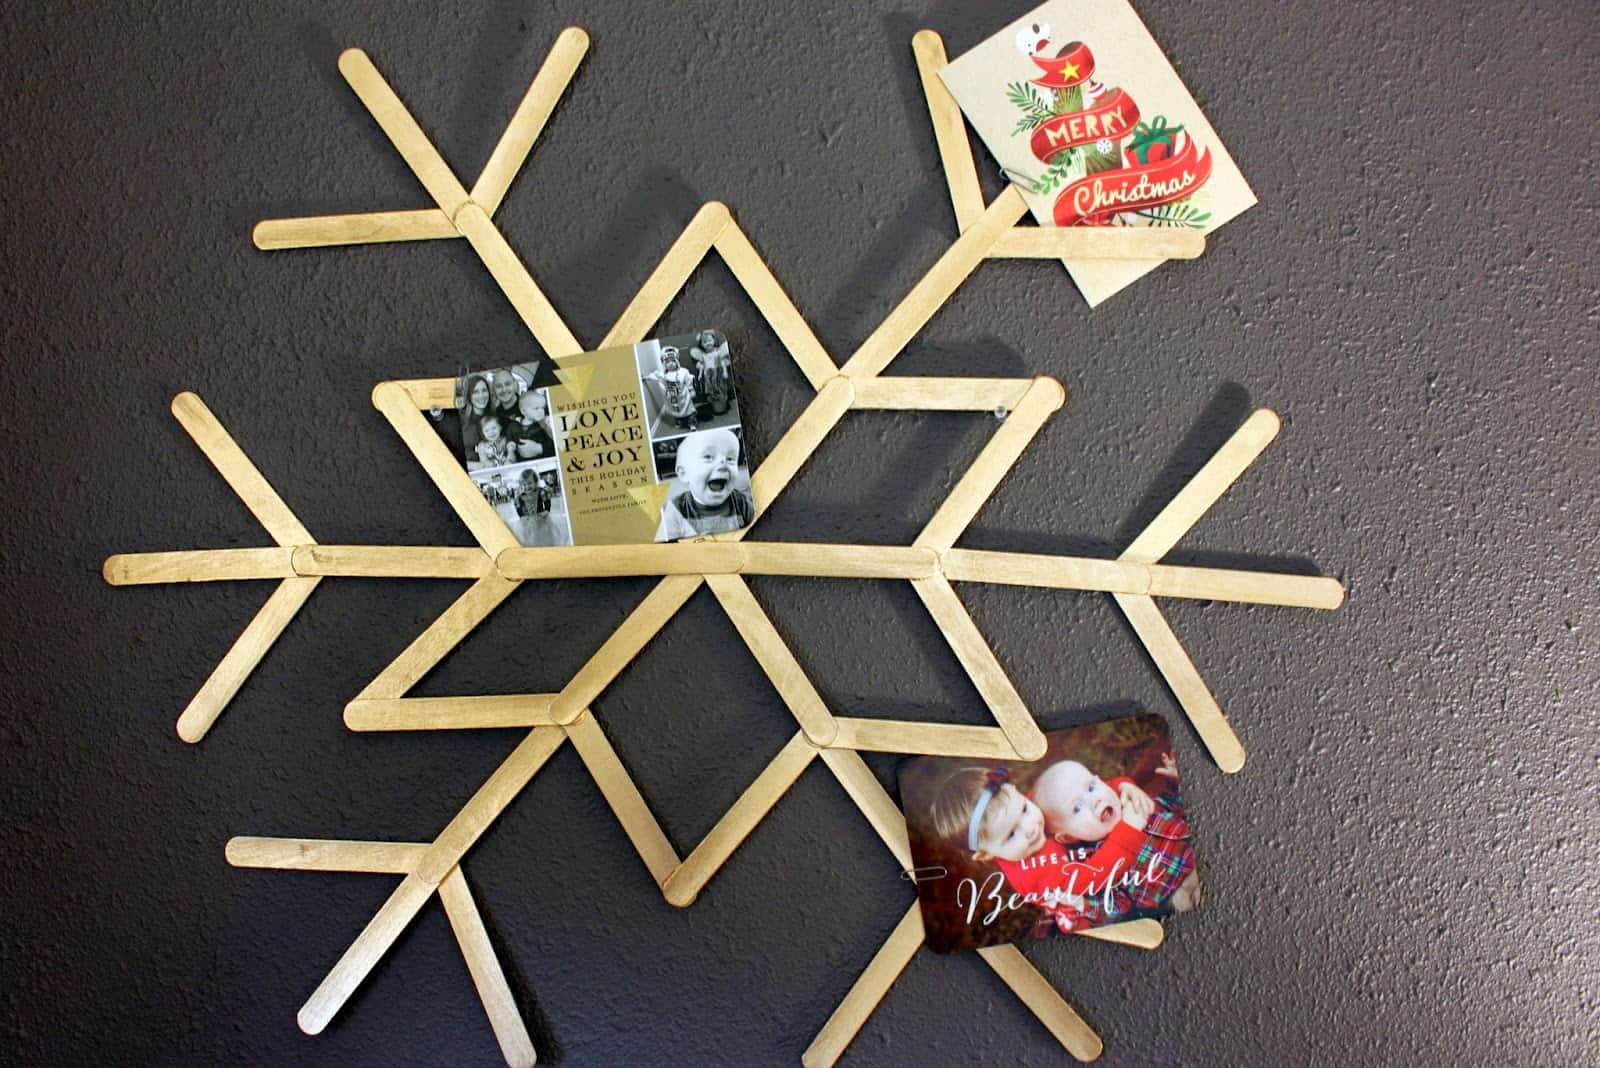 Popsicle stick snowflake Christmas card display